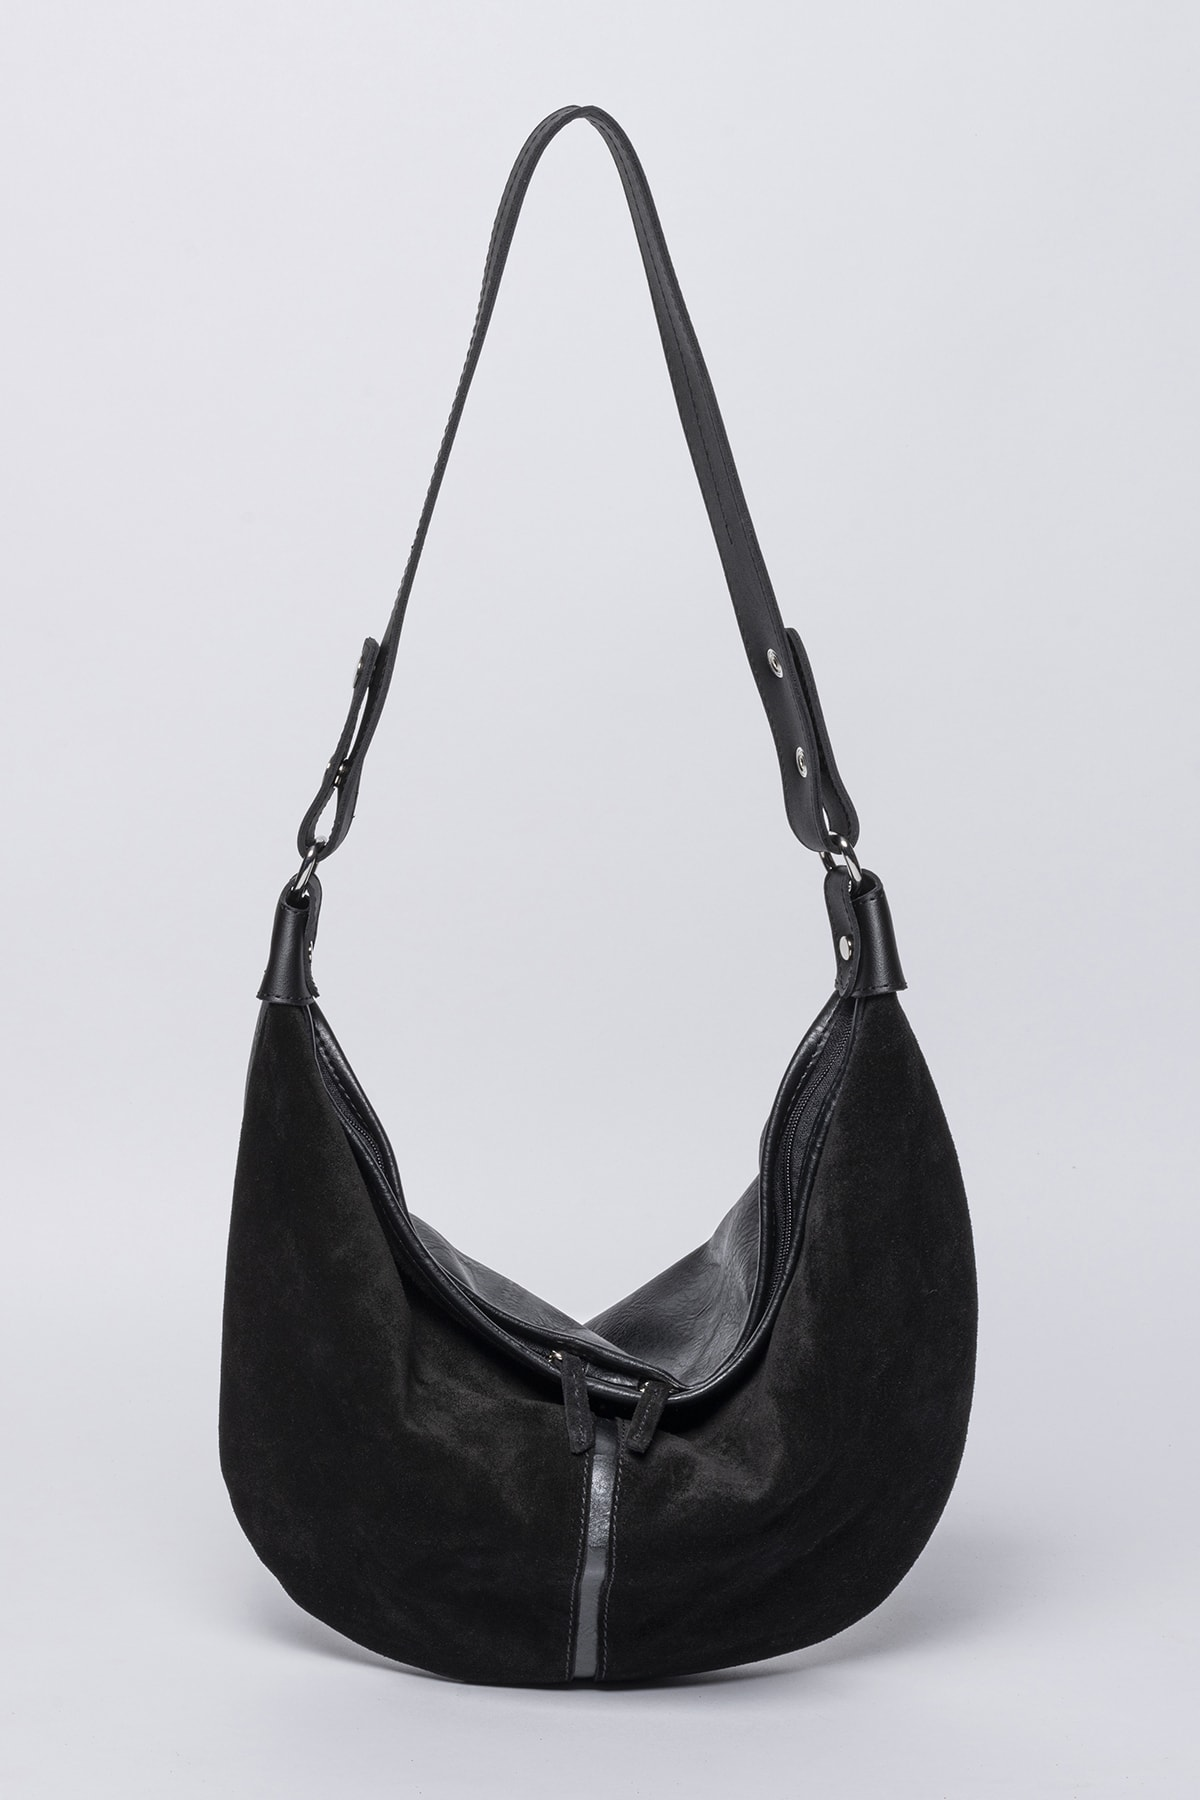 Jacquline Aeson Body Bag 2